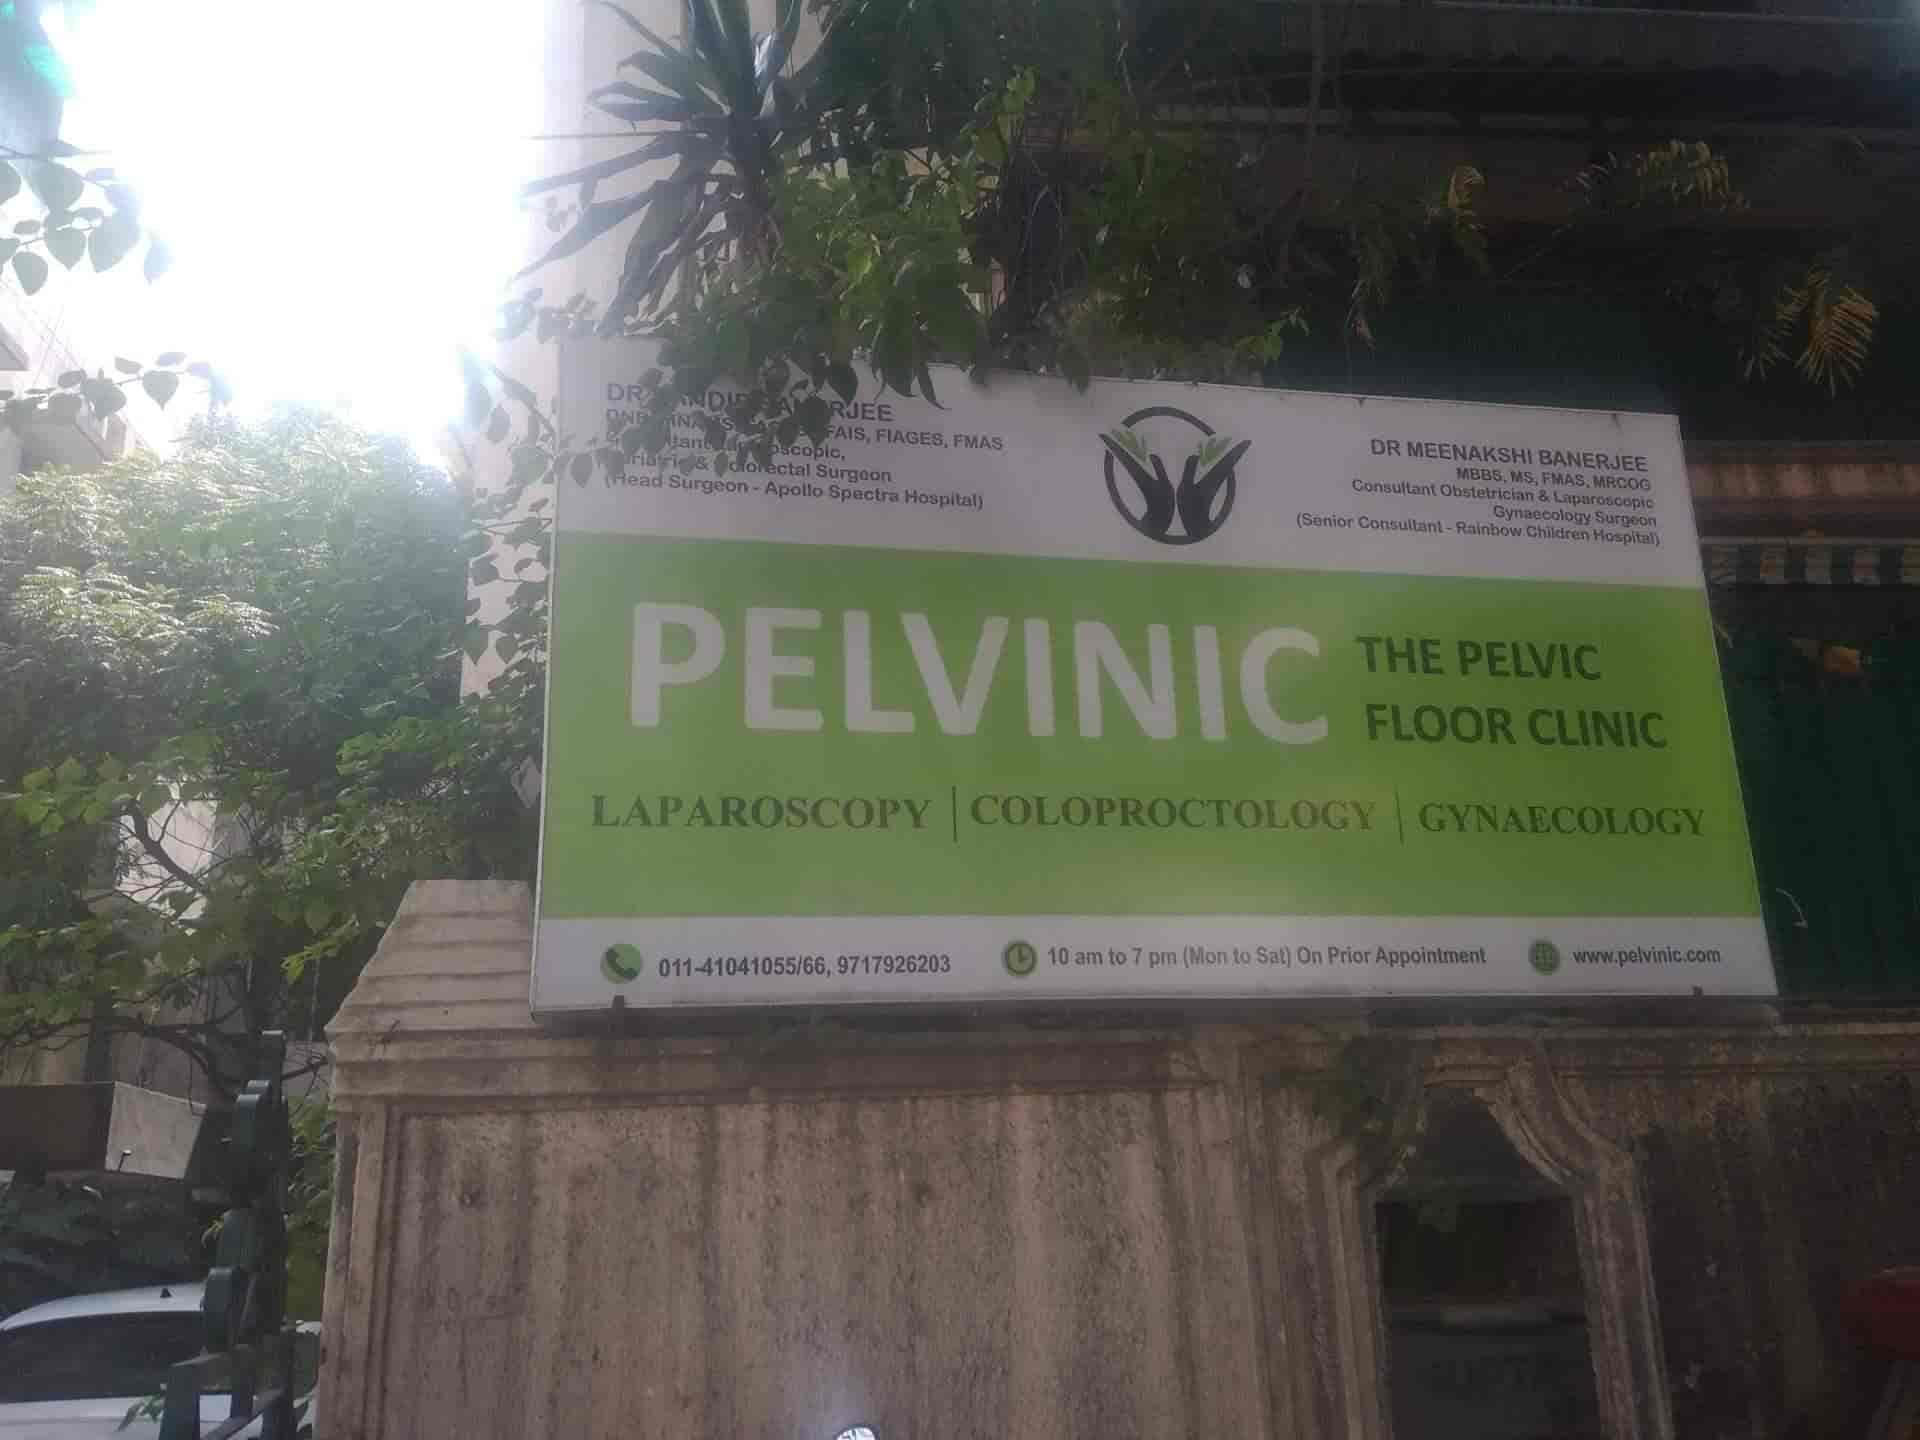 PELVINIC The Pelvic Floor Clinic - Gynaecologist & Obstetrician